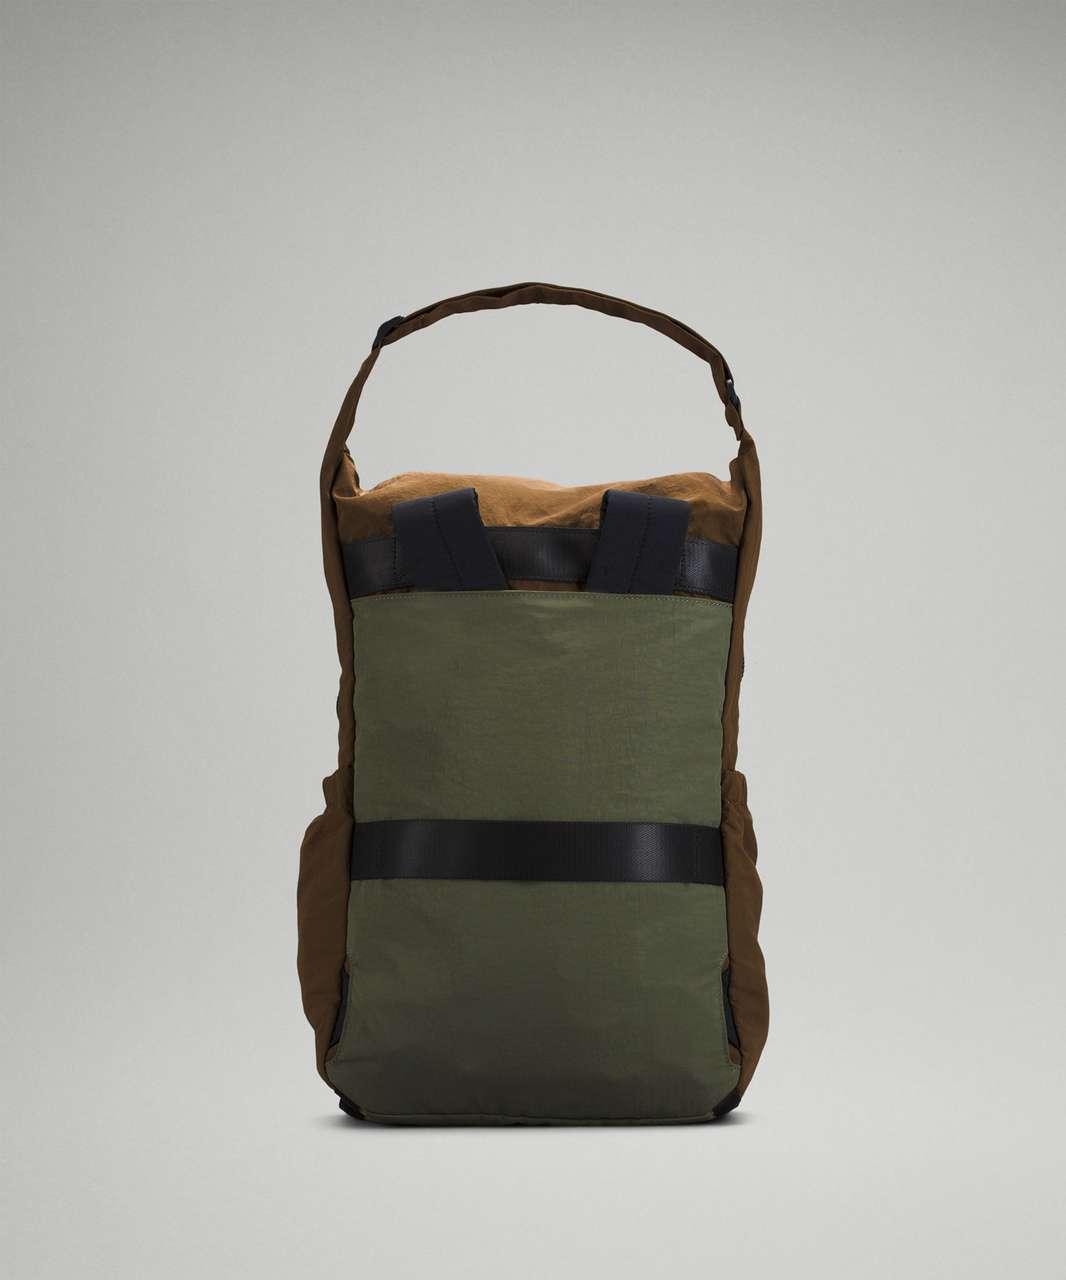 Lululemon Pack and Go Backpack 21L - Deep Artifact / Medium Olive / Gold Spice